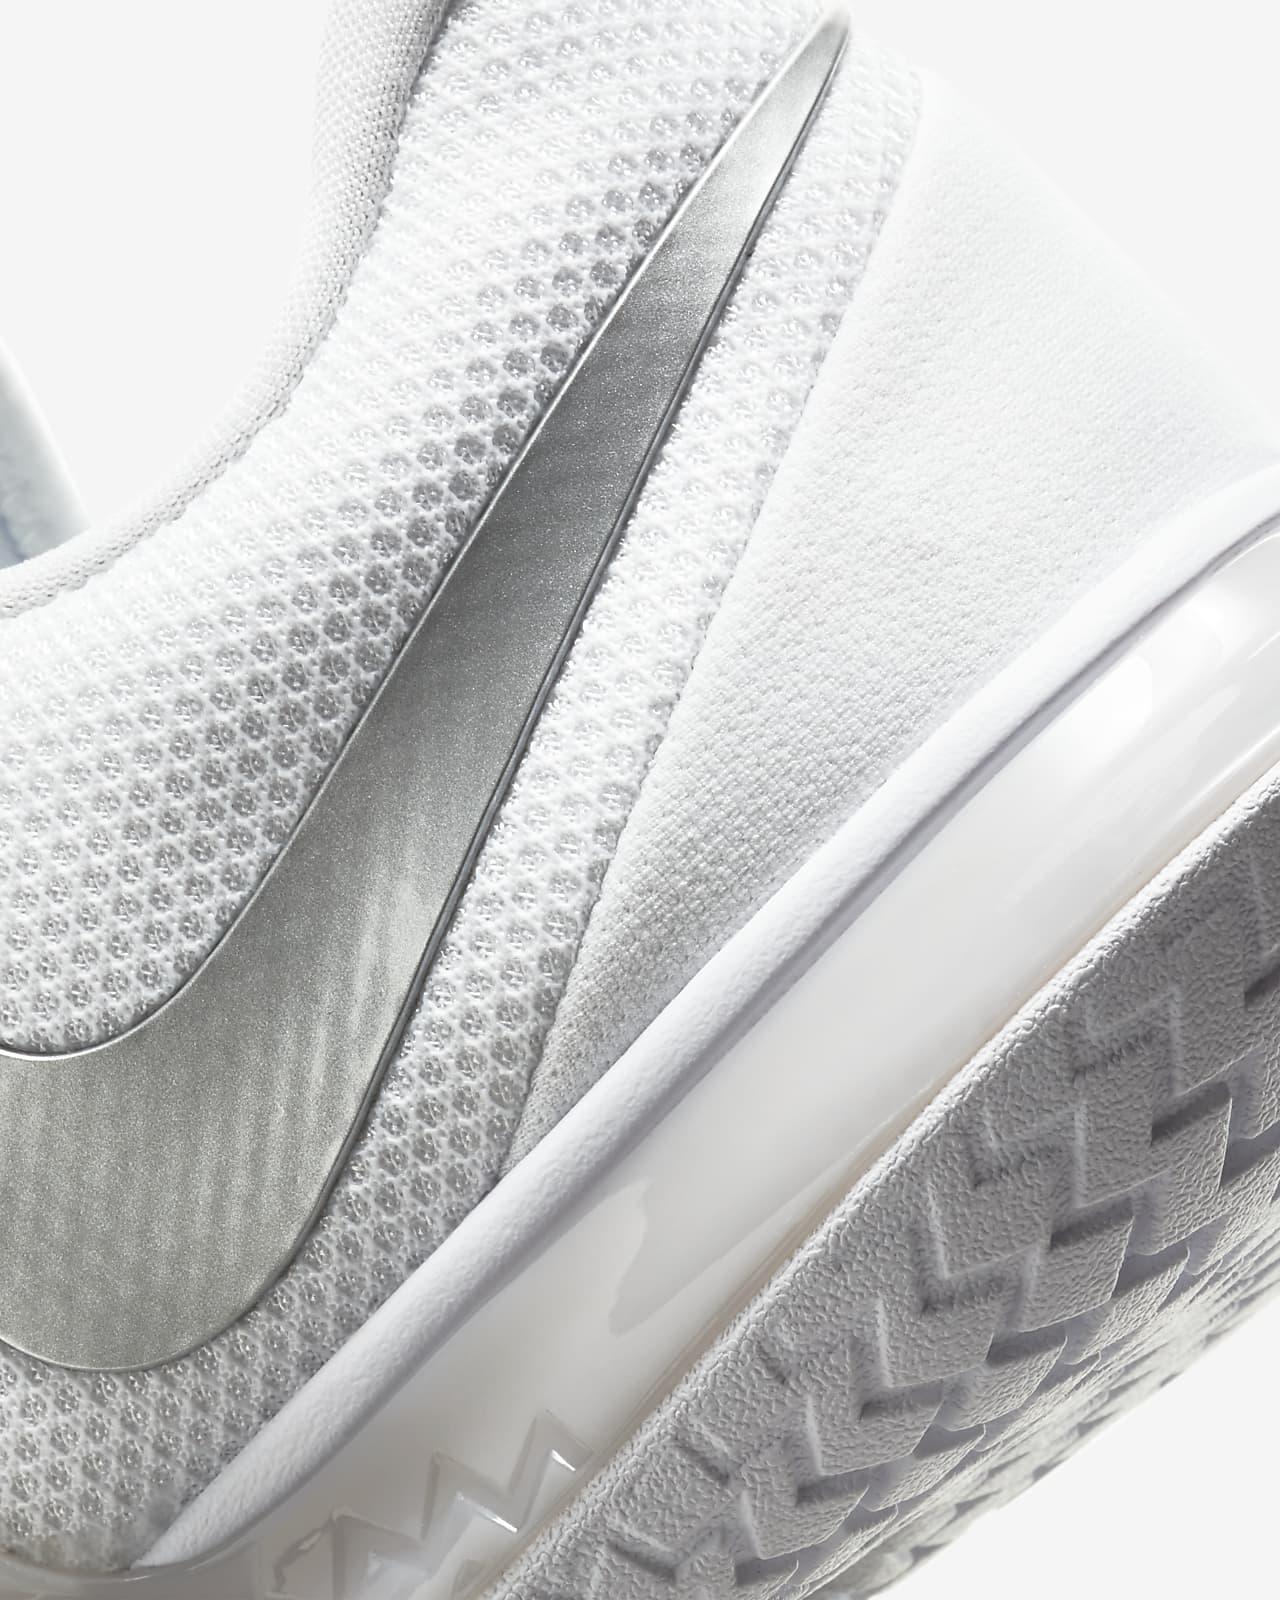 NikeCourt Air Zoom Vapor Cage 4 Women's Hard Court Tennis Shoes